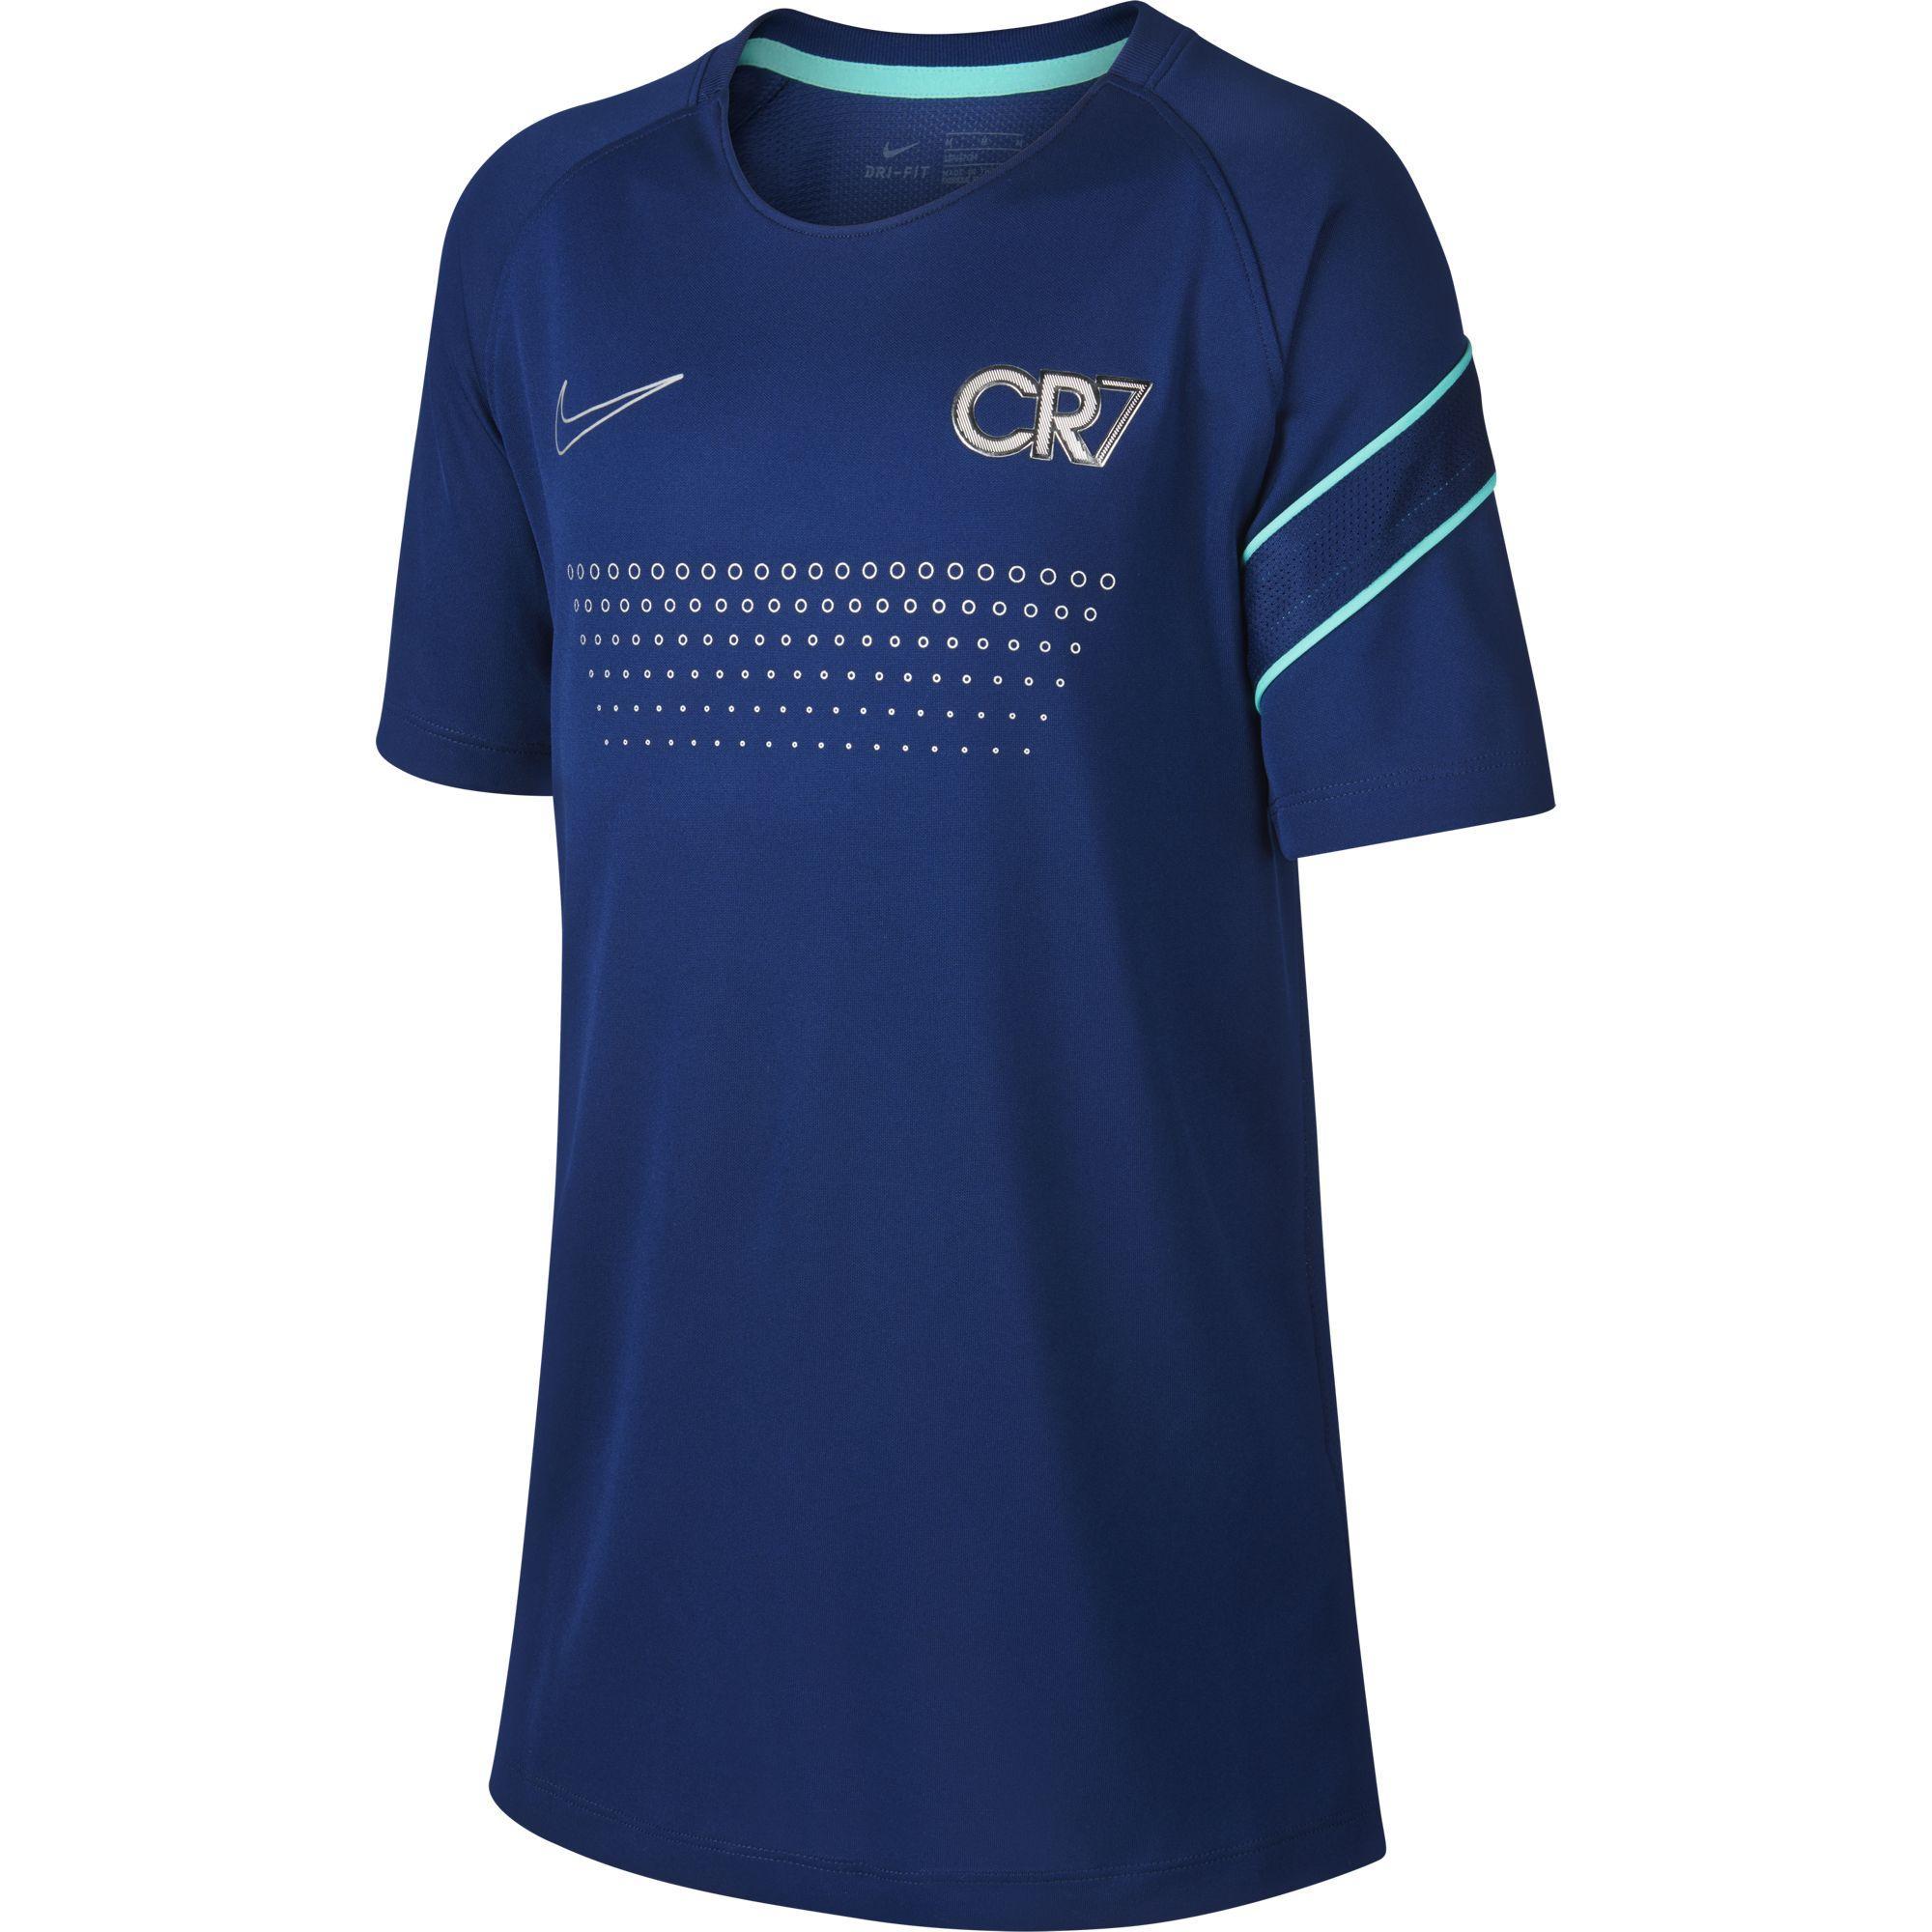 Nike T-shirt  Junior Cristiano Ronaldo